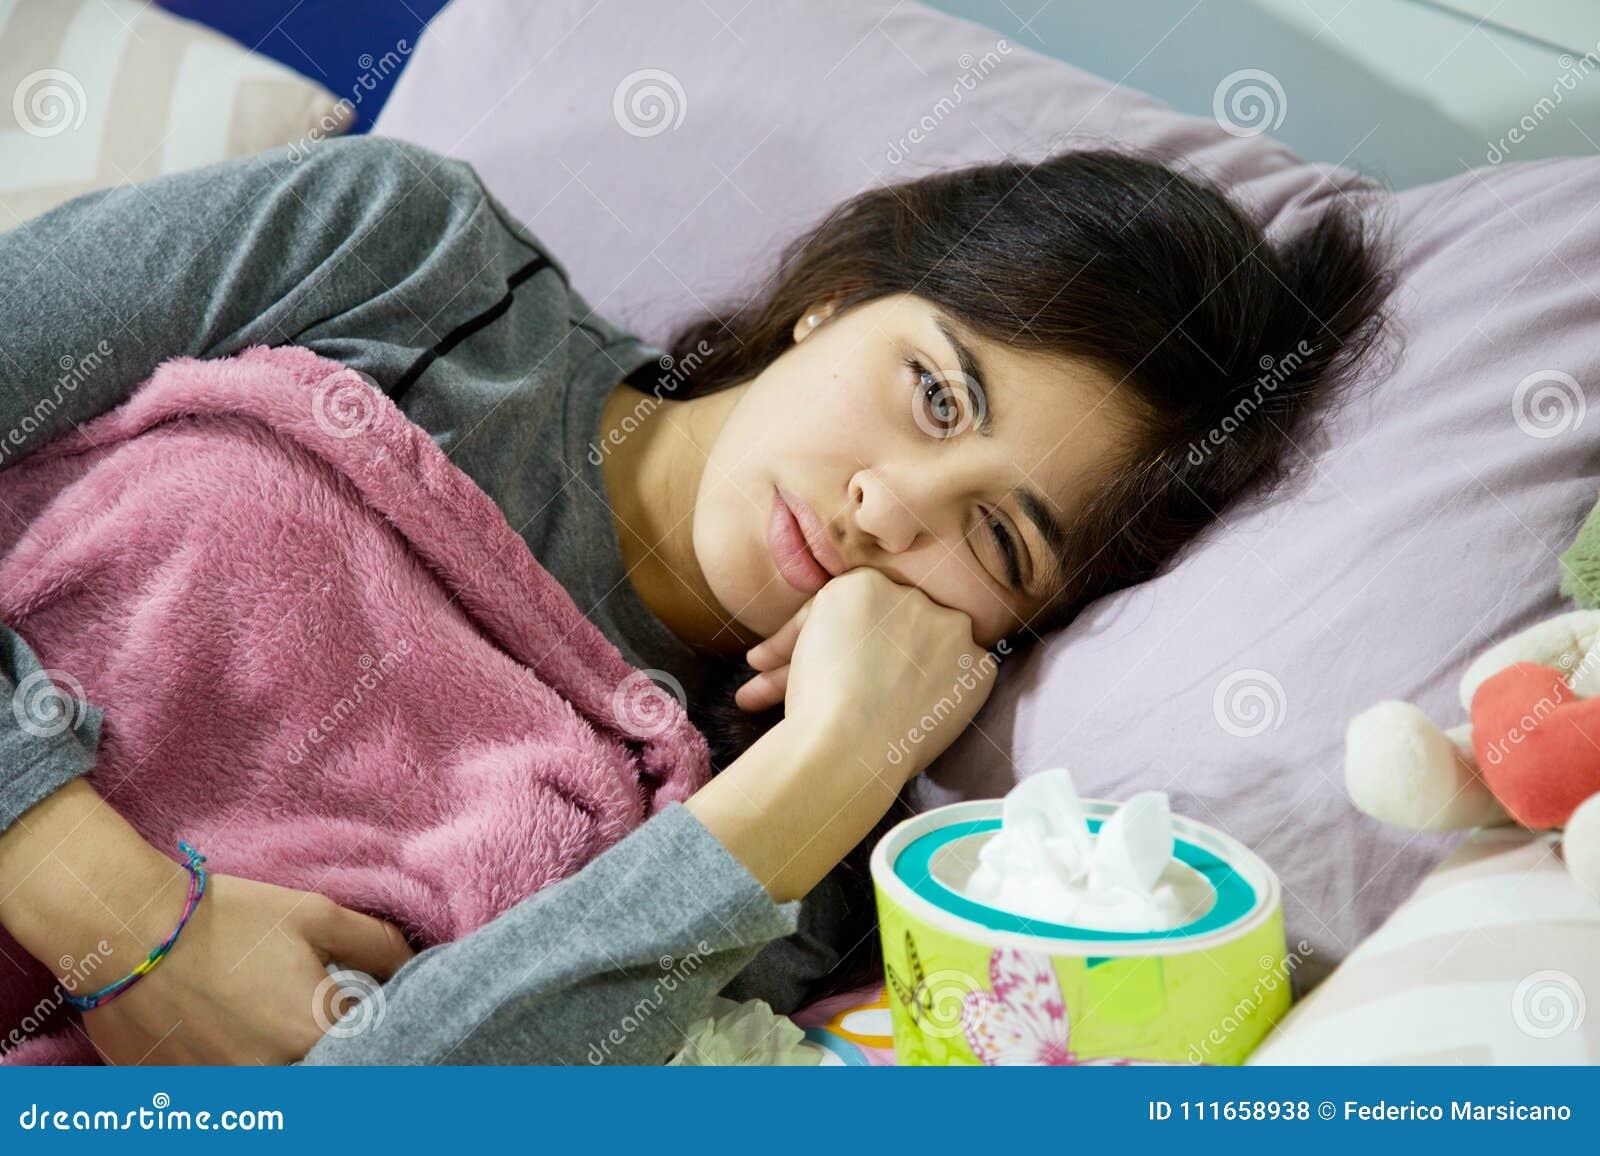 spanish women in bed